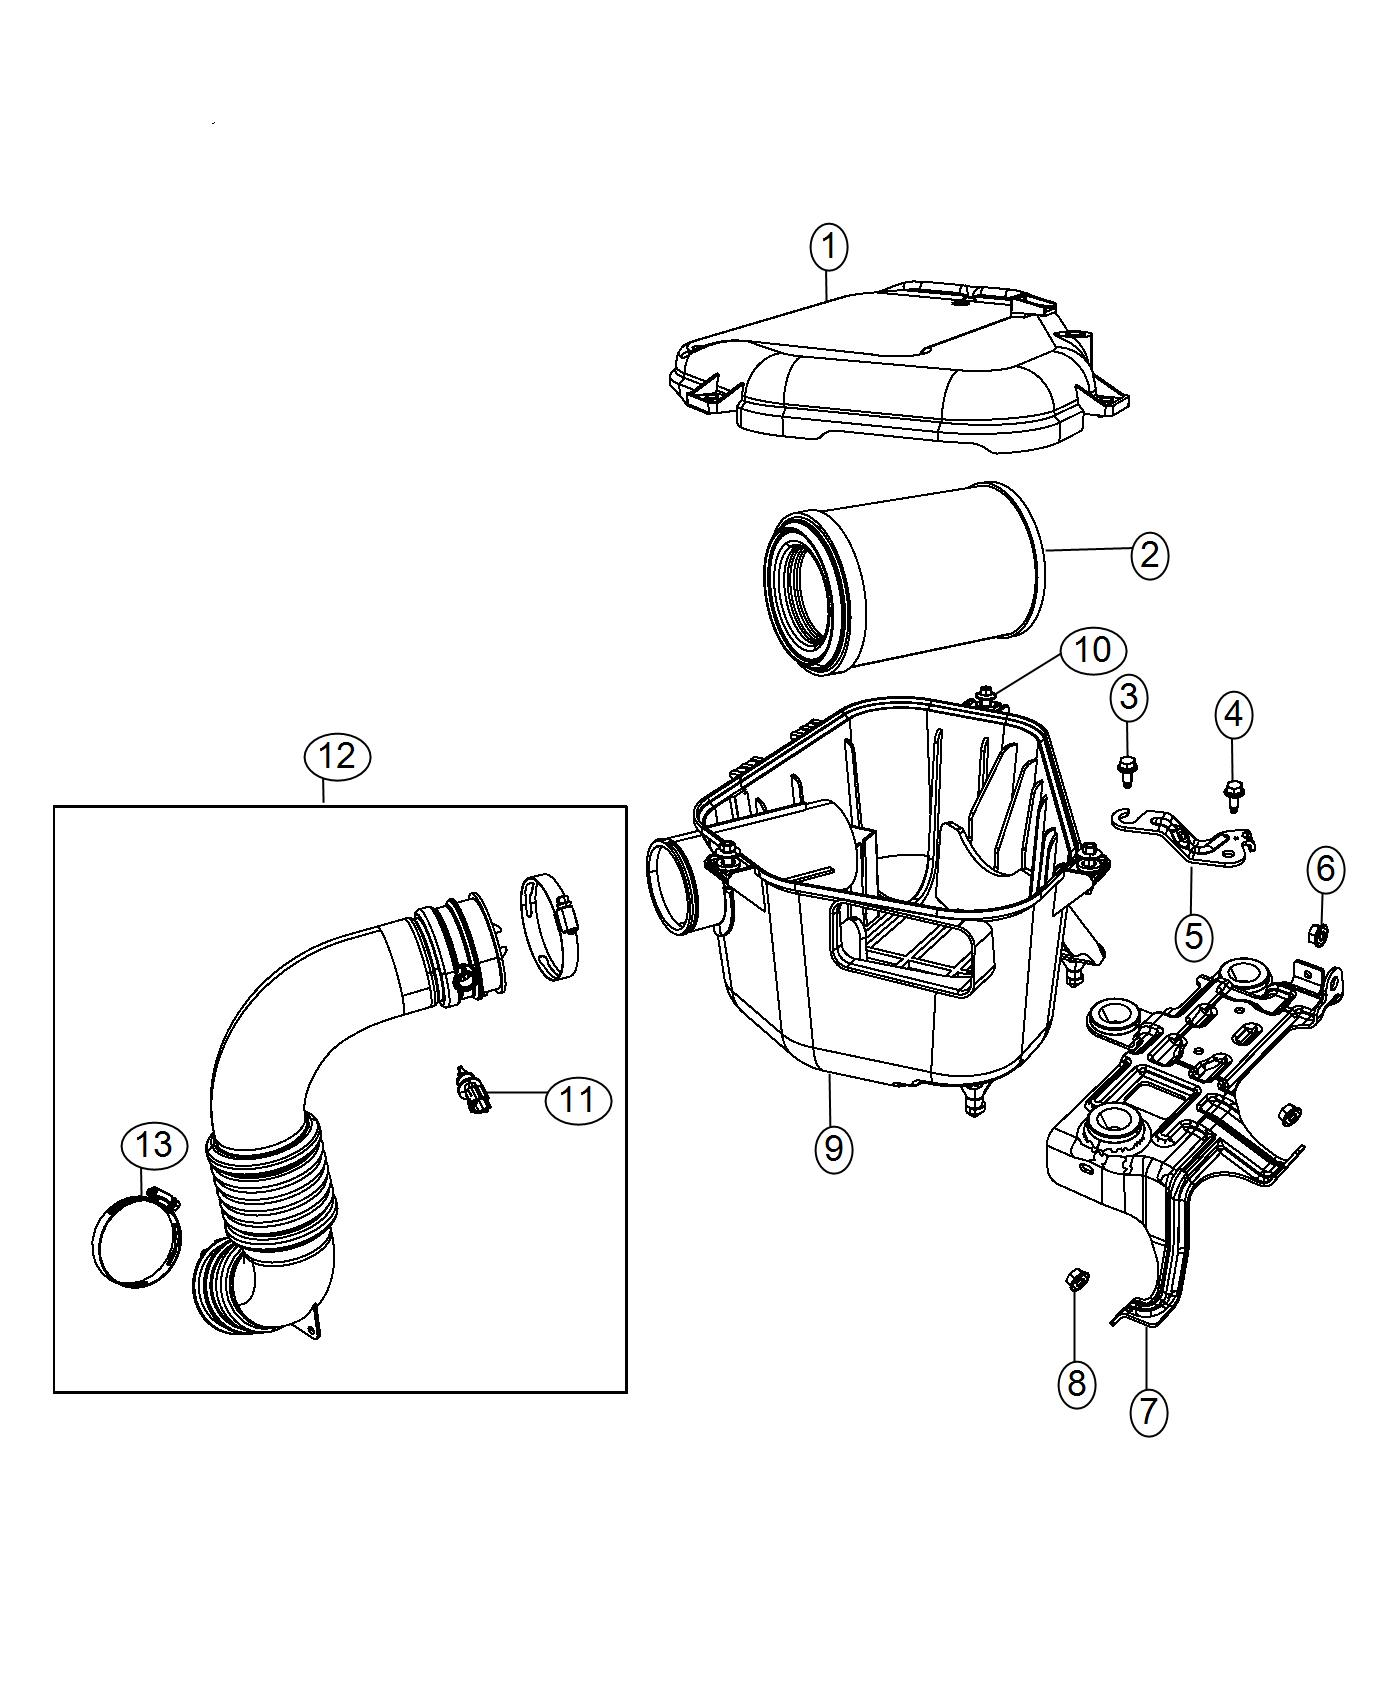 Jeep Compass Bracket Air Cleaner